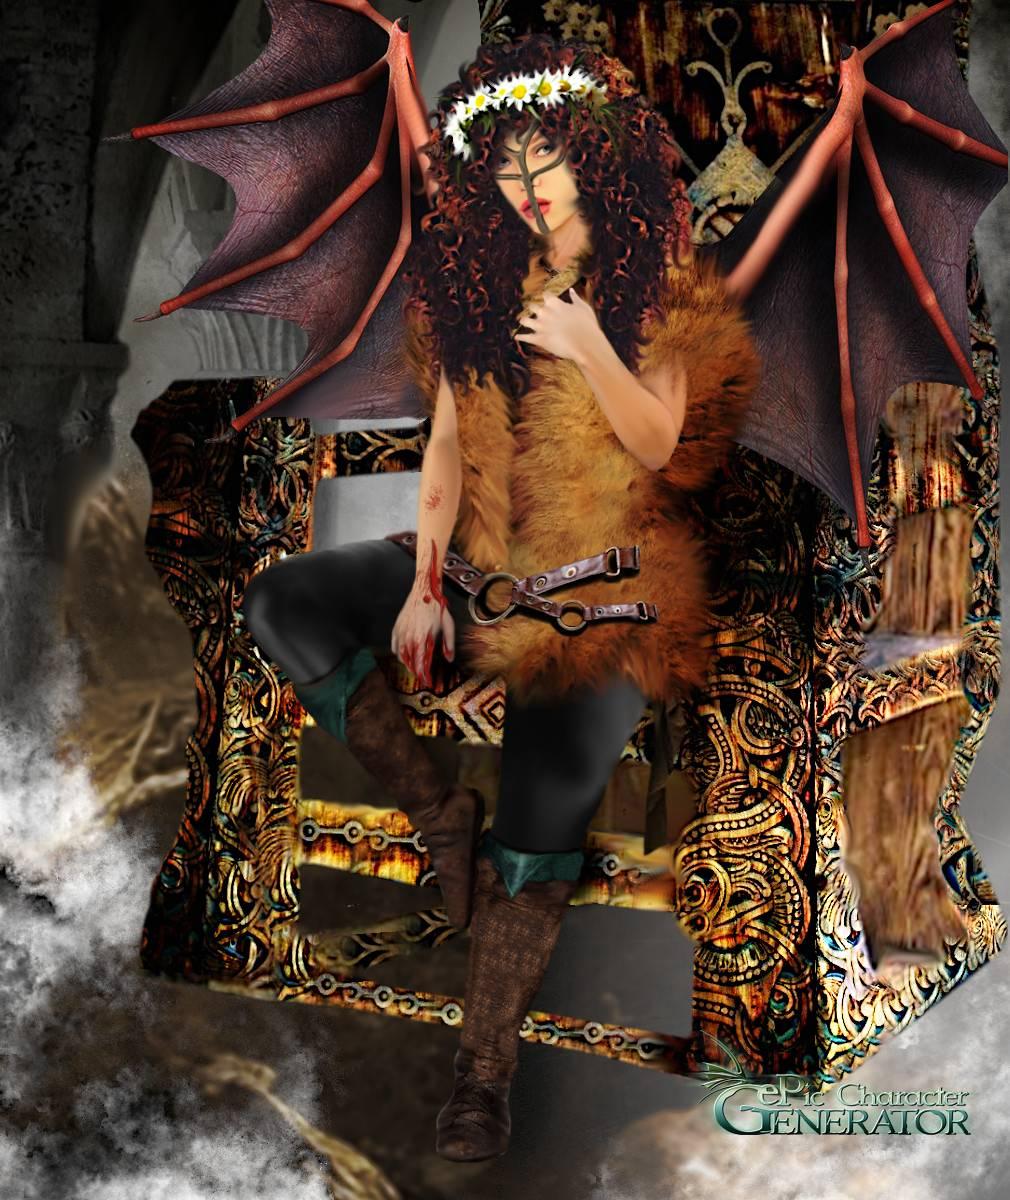 ePic Character Generator Season 3 Throne Lady Screenshot 03